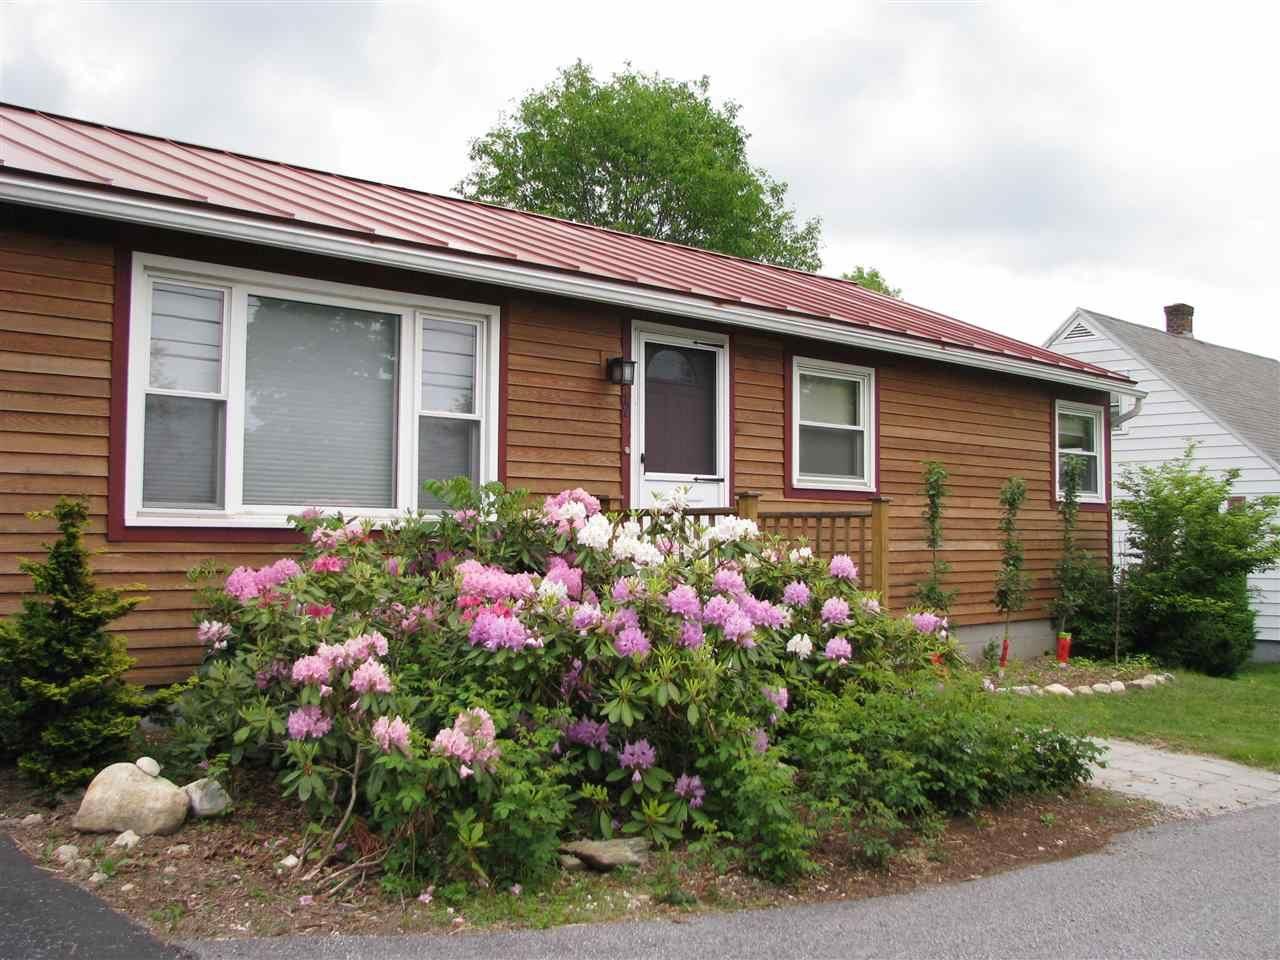 68 Stratton Road, Rutland, VT 05701 - MLS#: 4789519